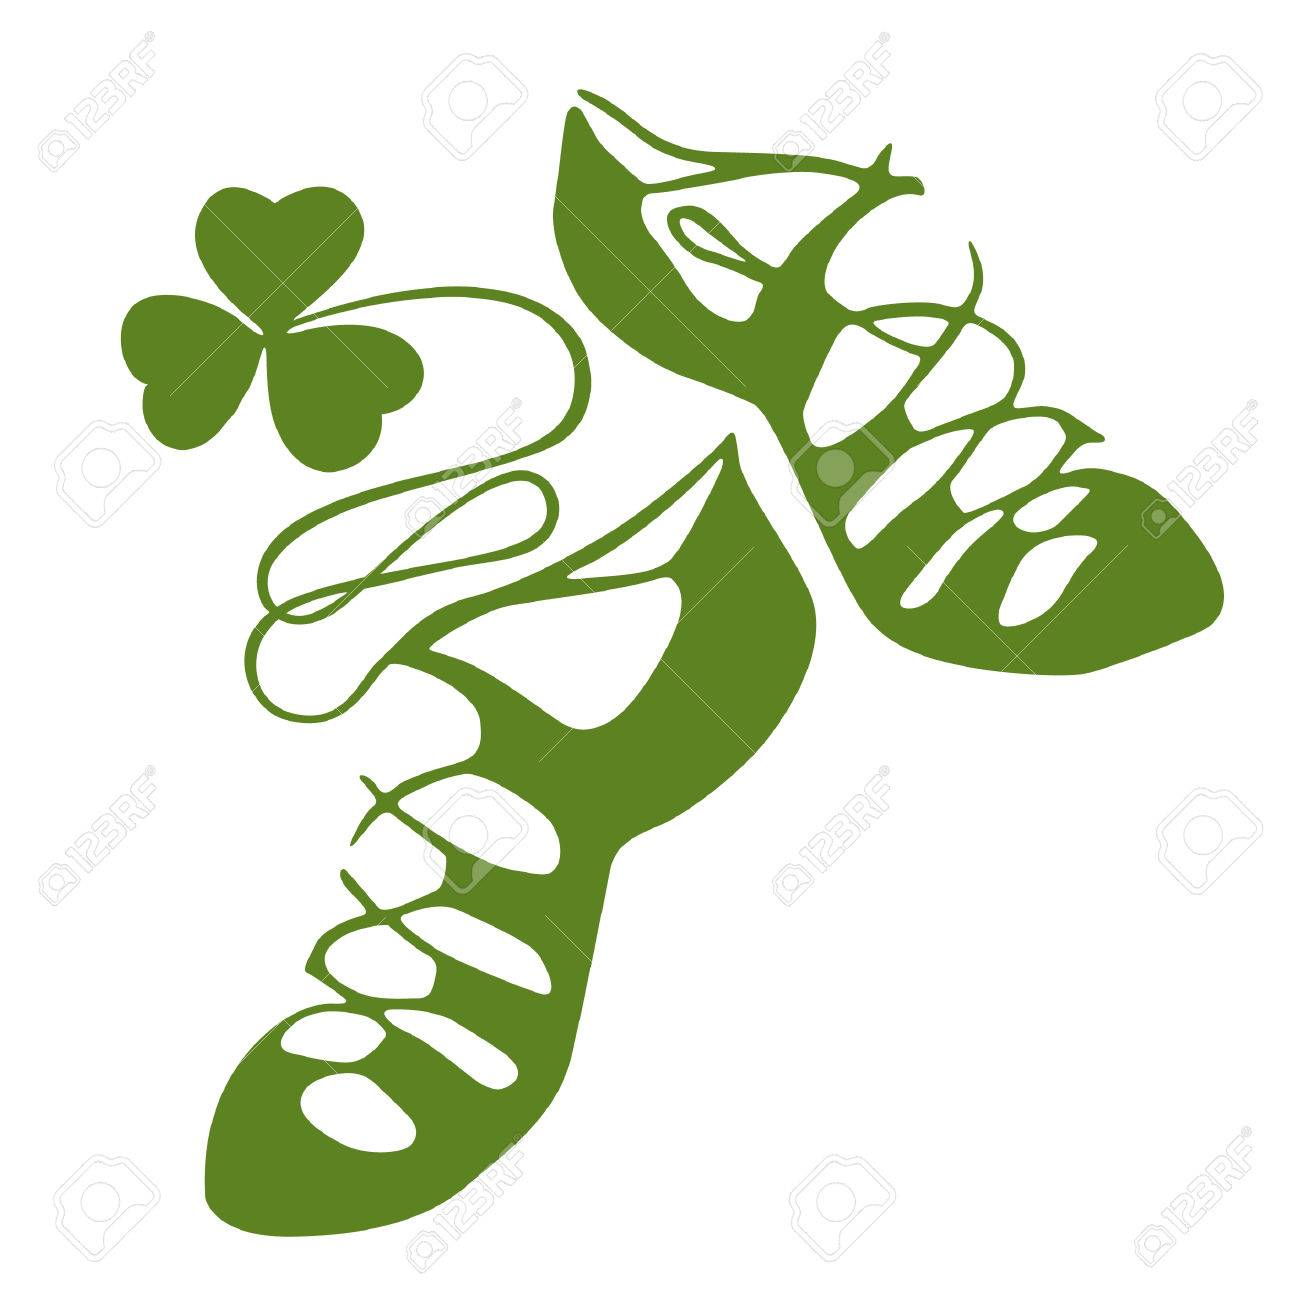 Irish dance shoes clipart 4 » Clipart Station.